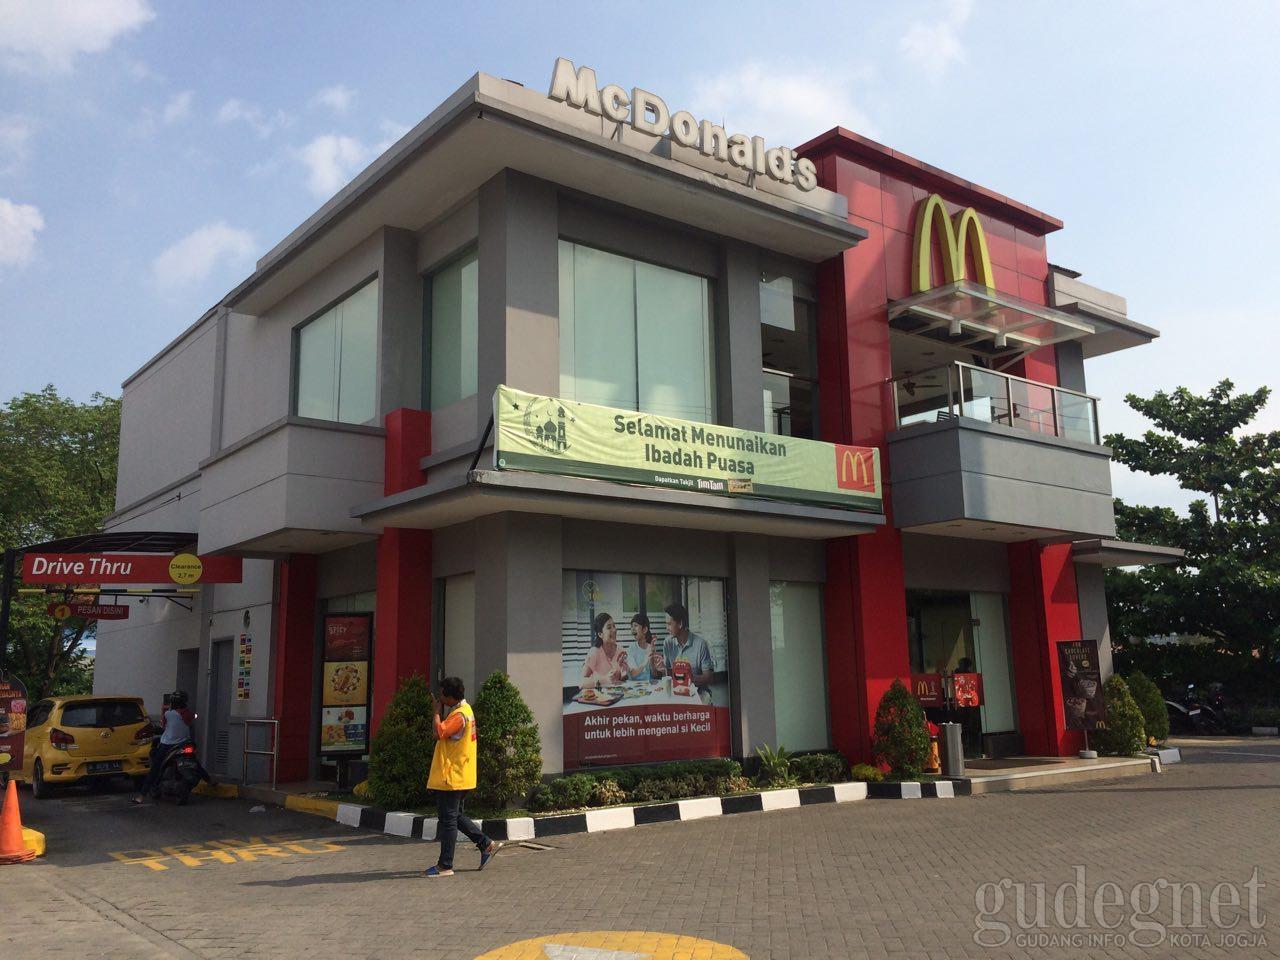 McDonald's Sudirman Drive Thru DI Yogyakarta